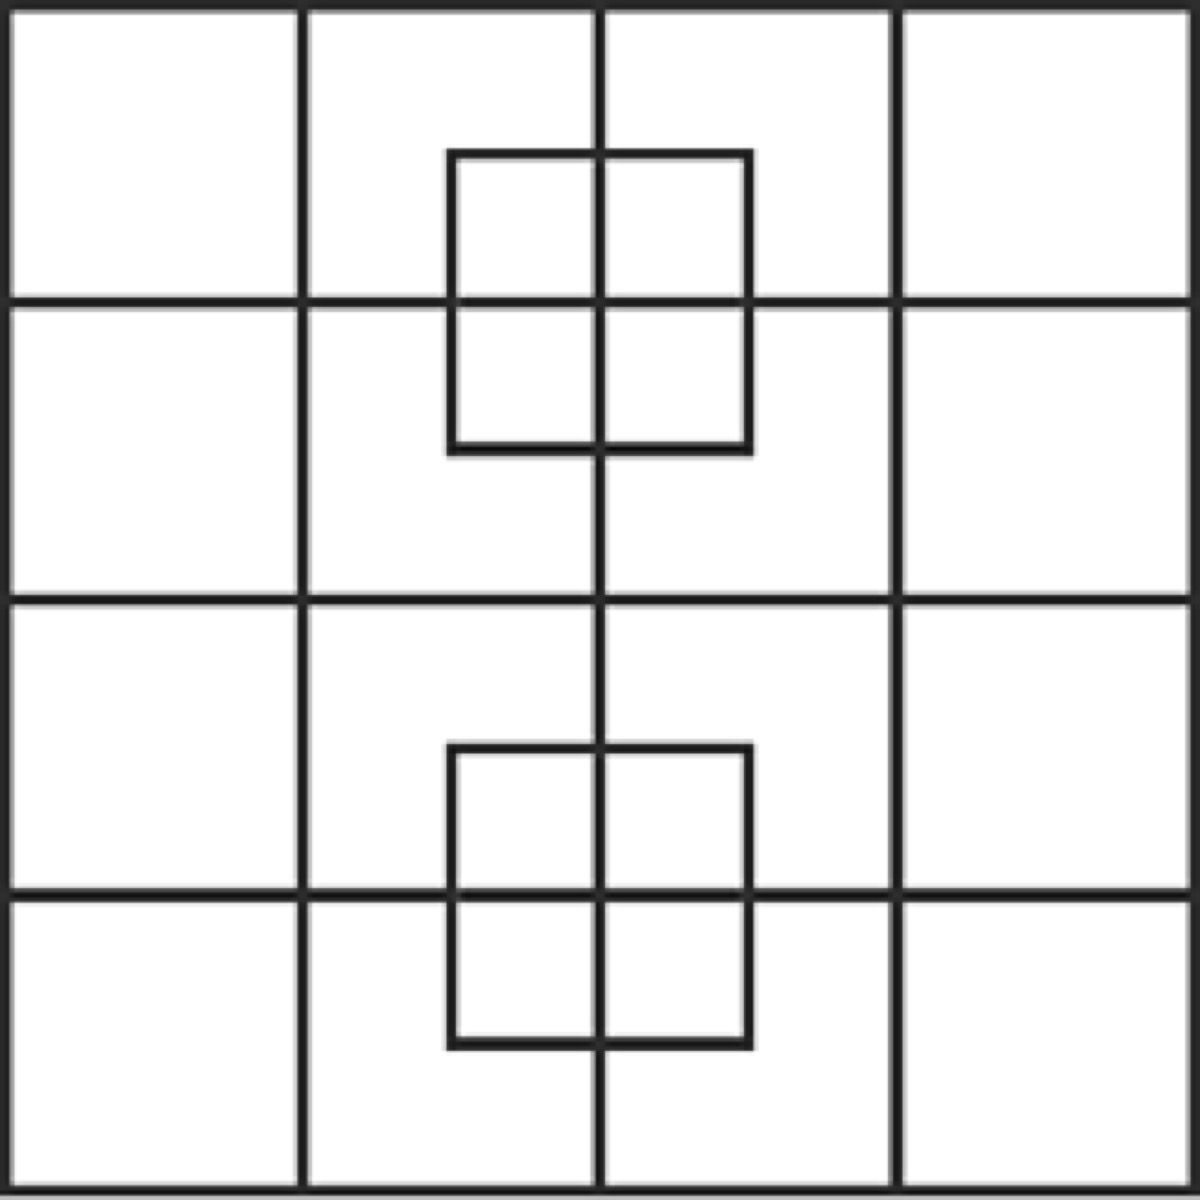 Perceptual puzzle